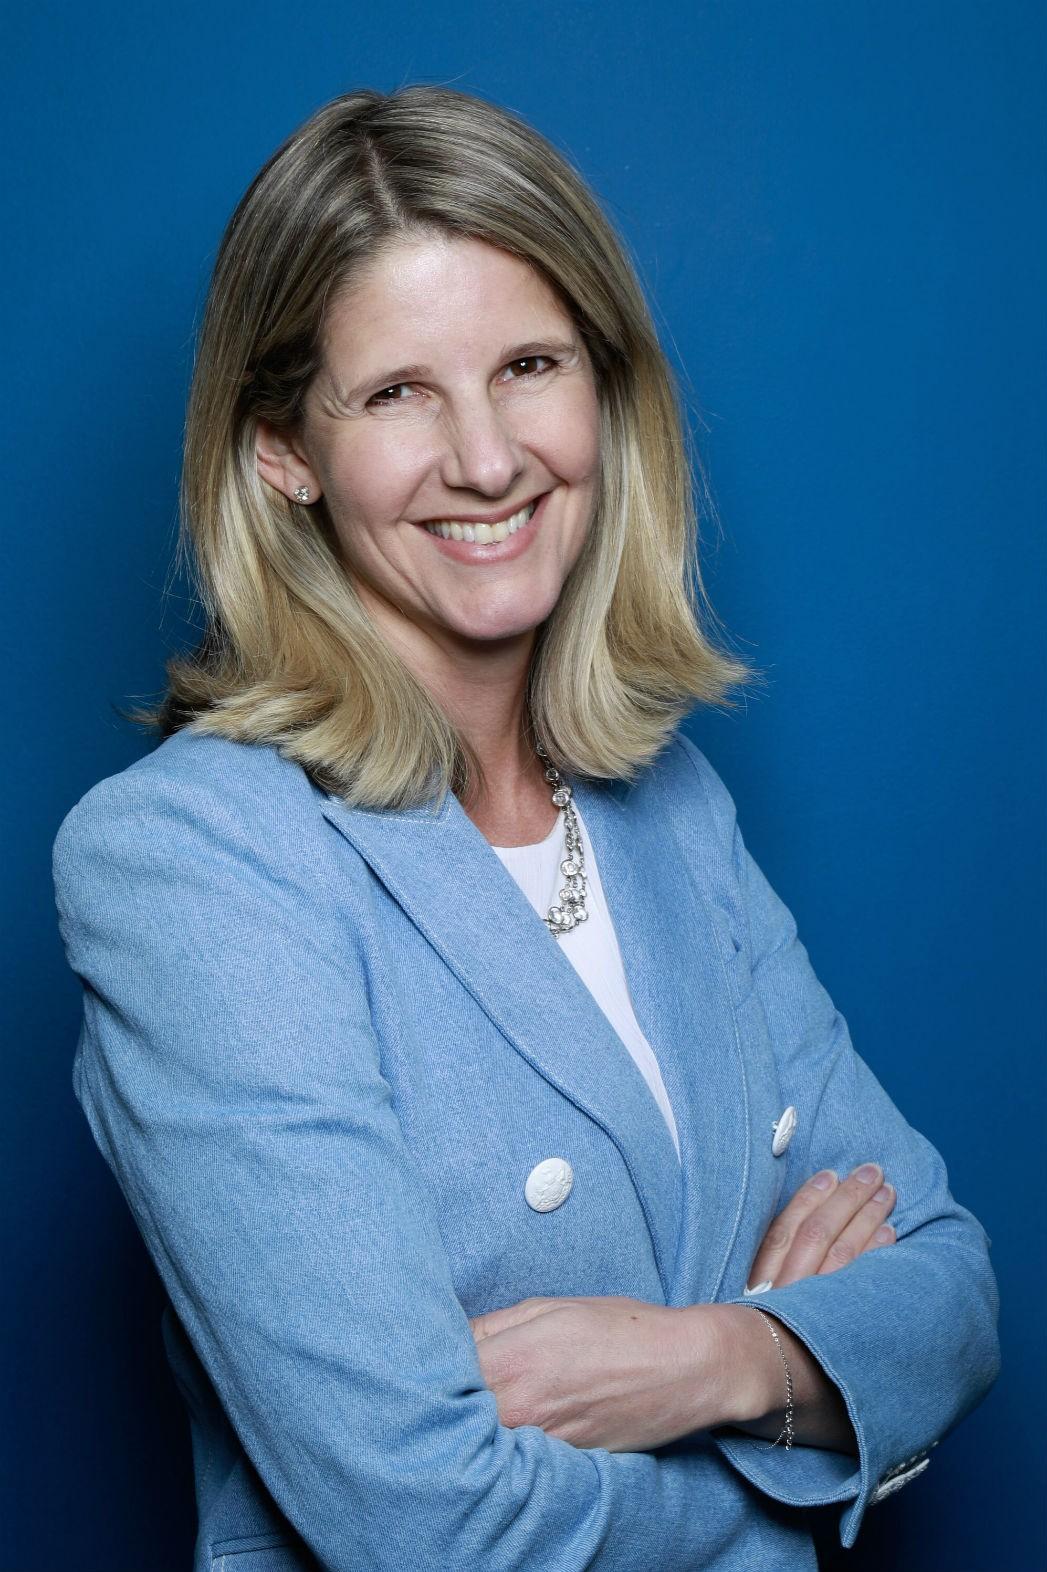 SiriusXM Names Jennifer Witz CEO, Jim Meyer to Become Vice Chair